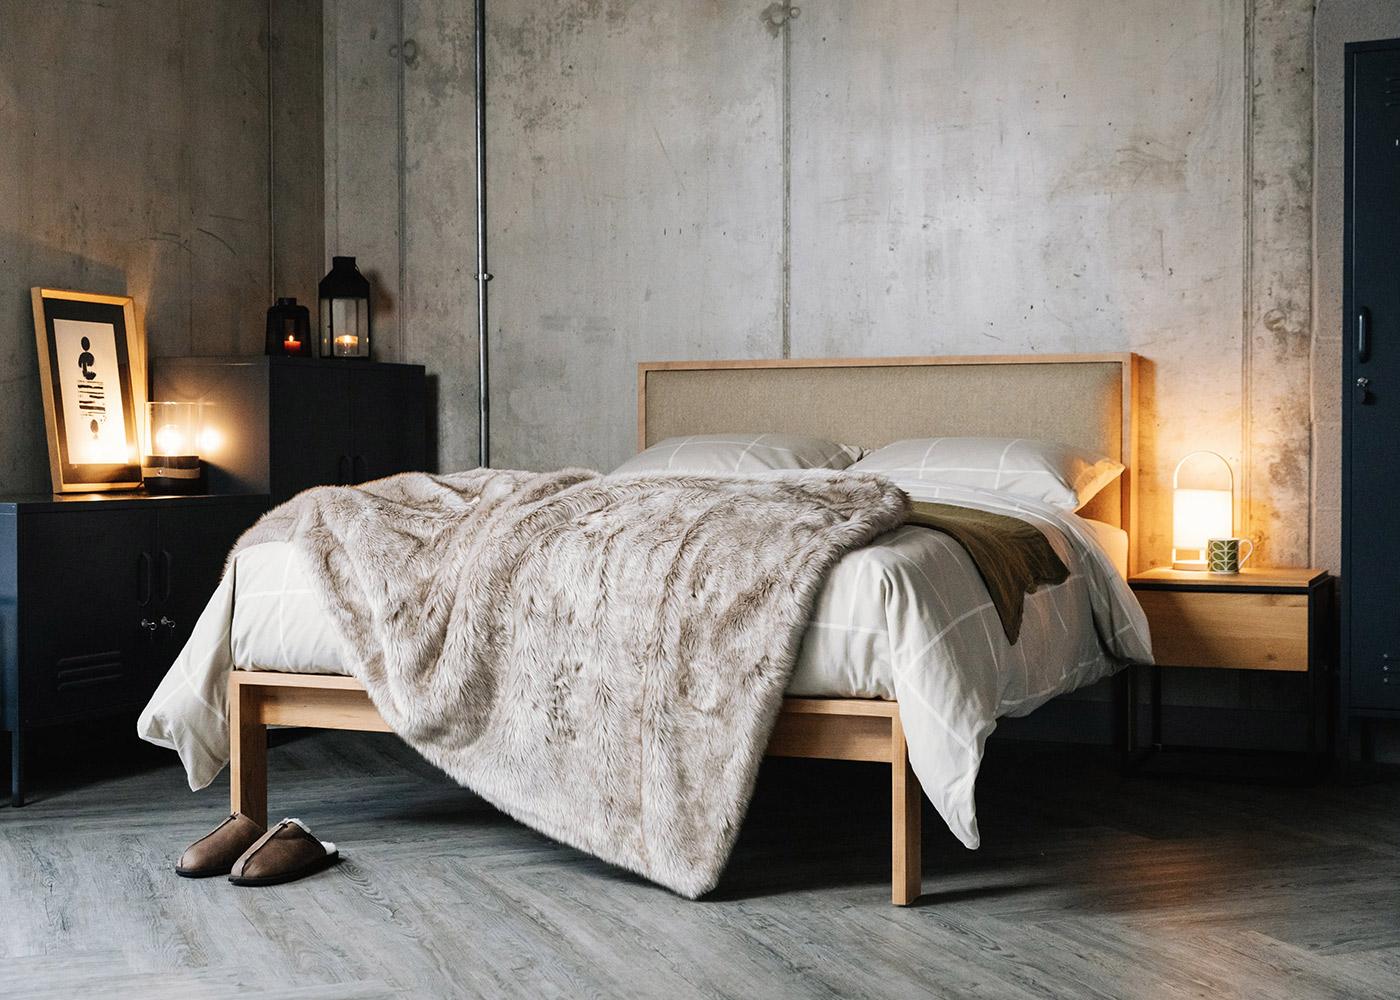 Winter Bedroom Look - Cherry Shetland Bed with upholstered headboard